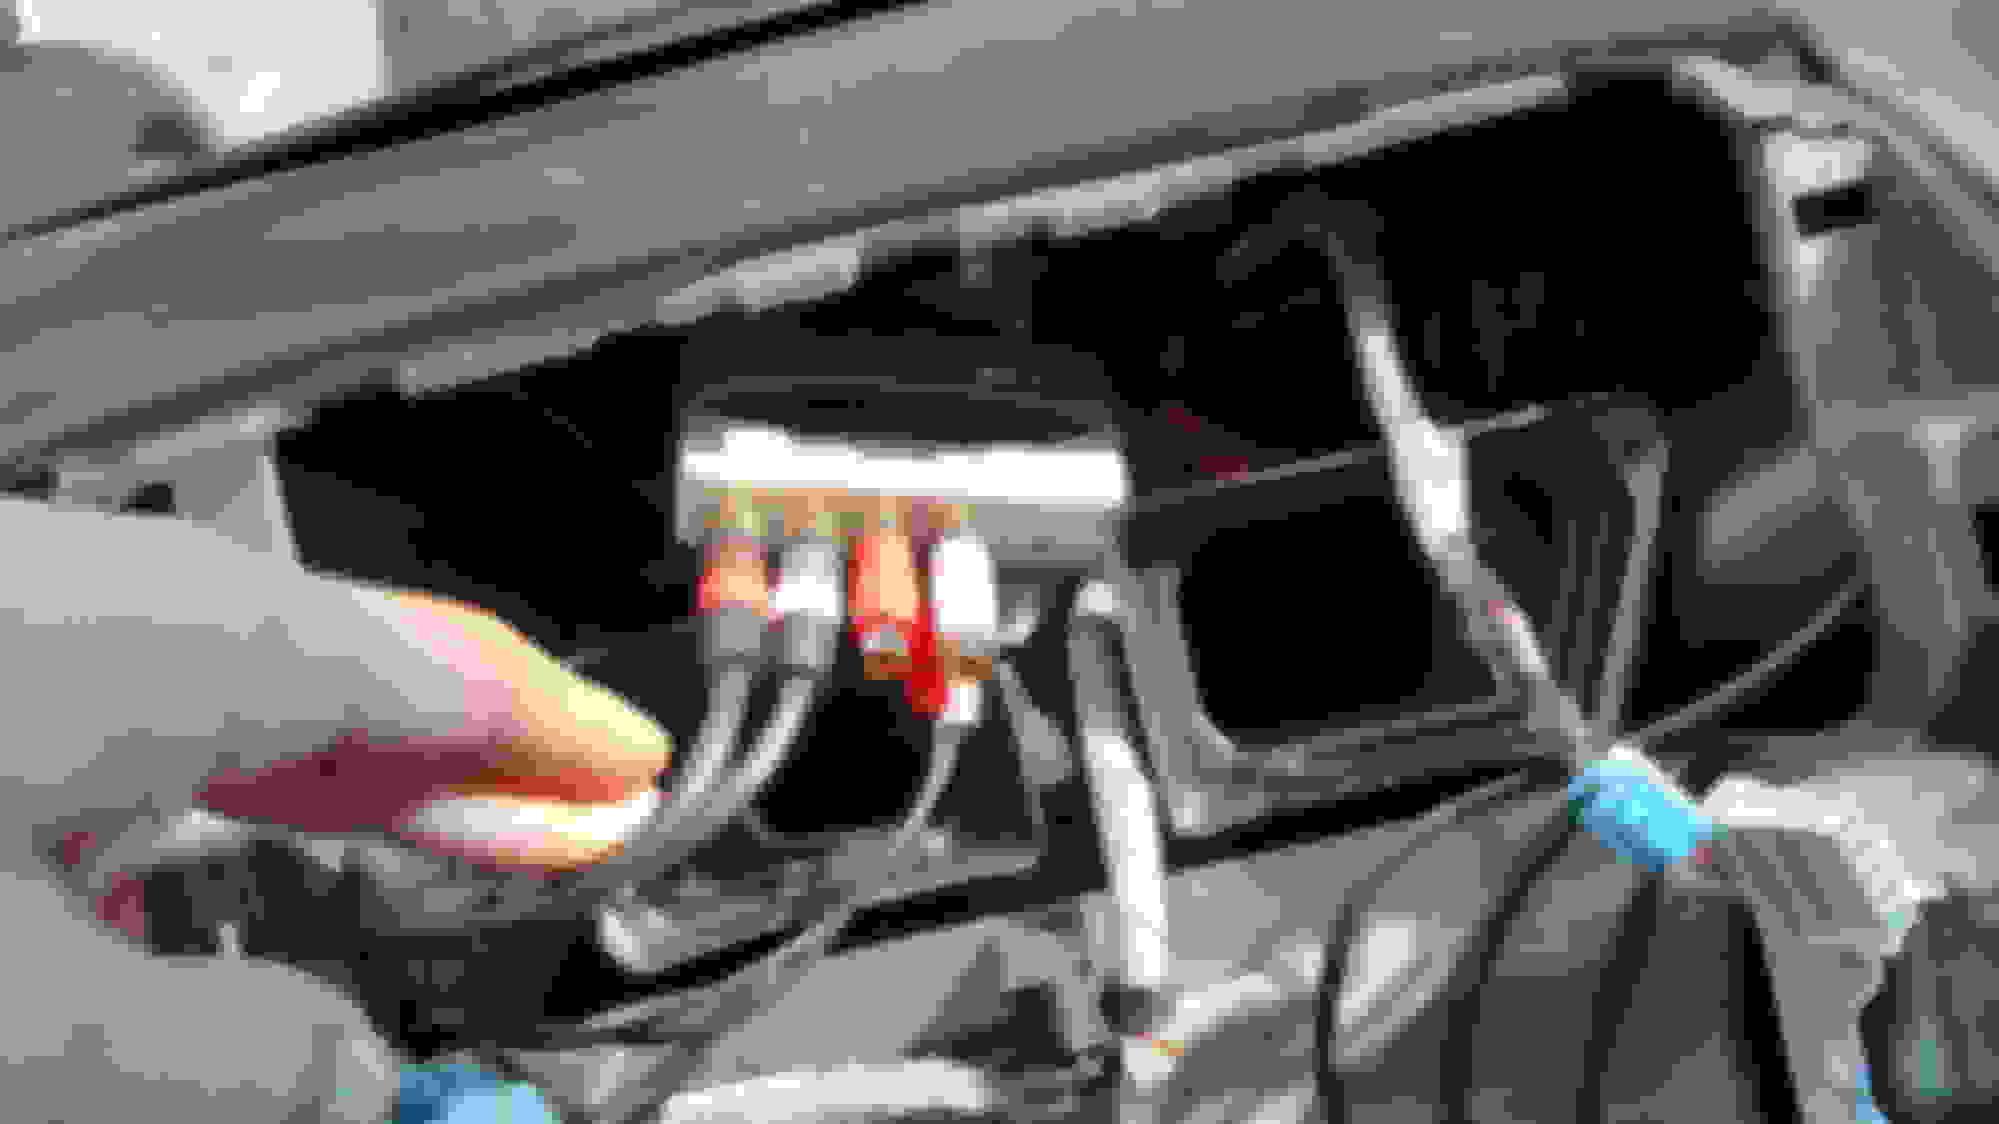 DIY Nexus 7 install in an '04 - AcuraZine - Acura Enthusiast